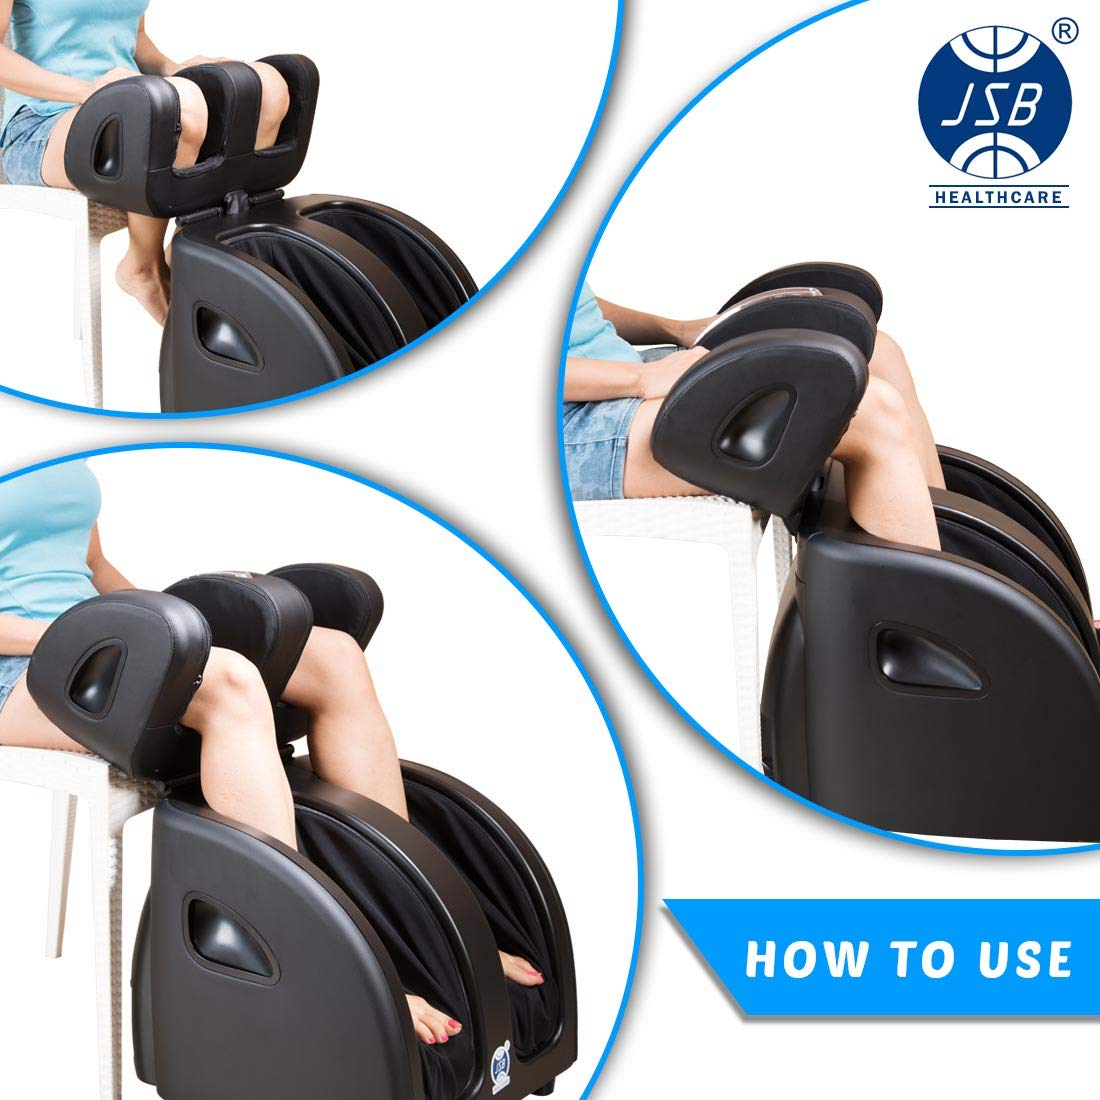 JSB HF60 Shiatsu Leg Foot Massager